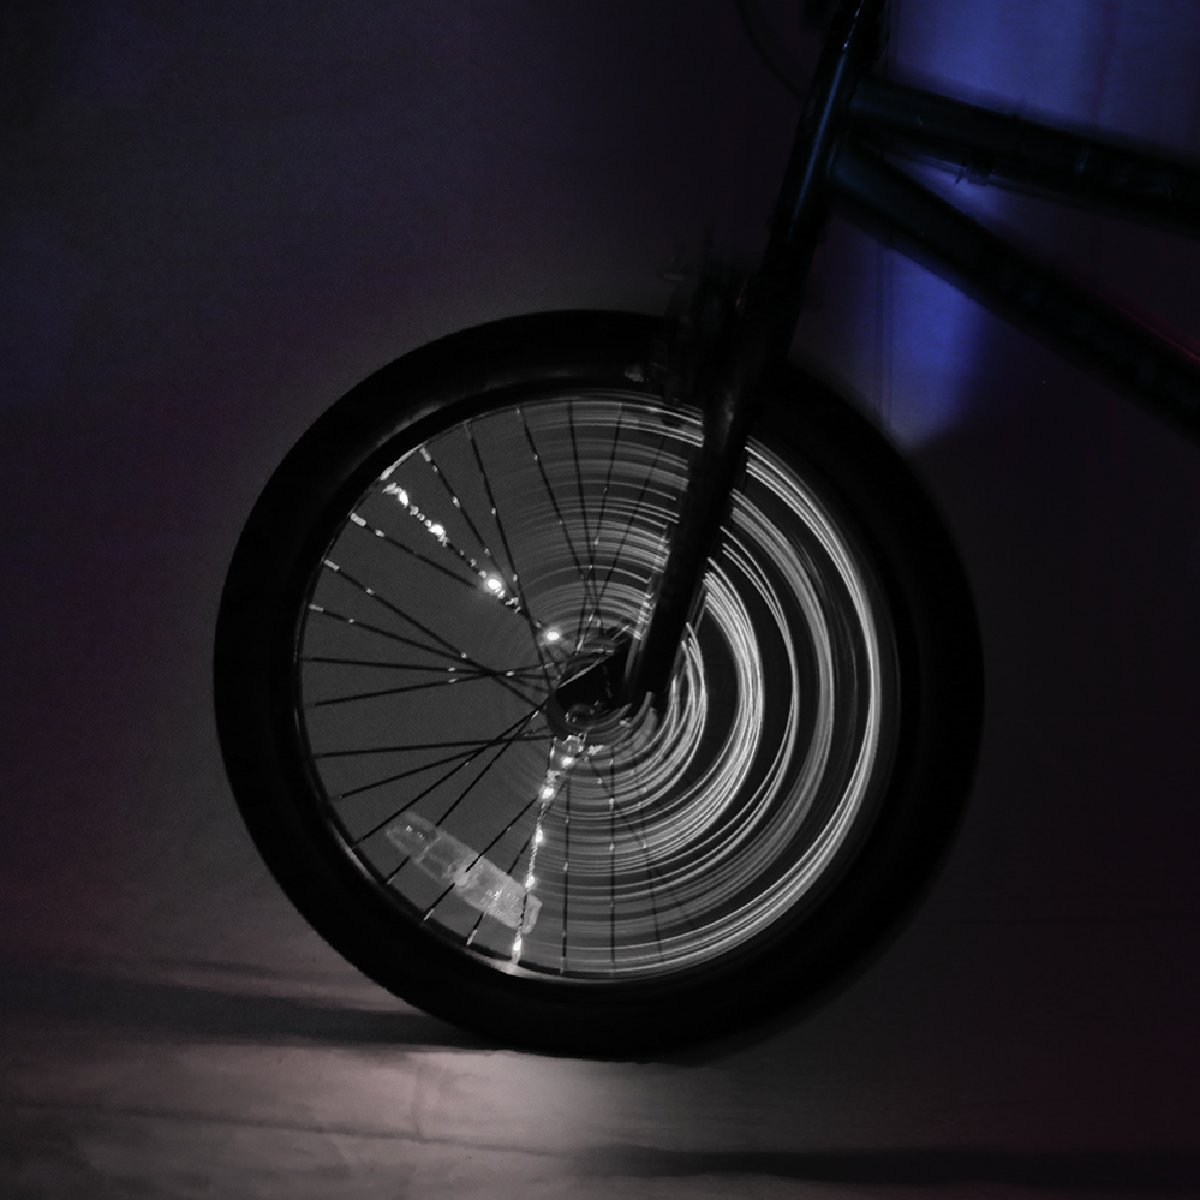 Brightz, Ltd. Spoke Brightz LED Bicycle Spoke Accessory Light (for 1 Wheel), White